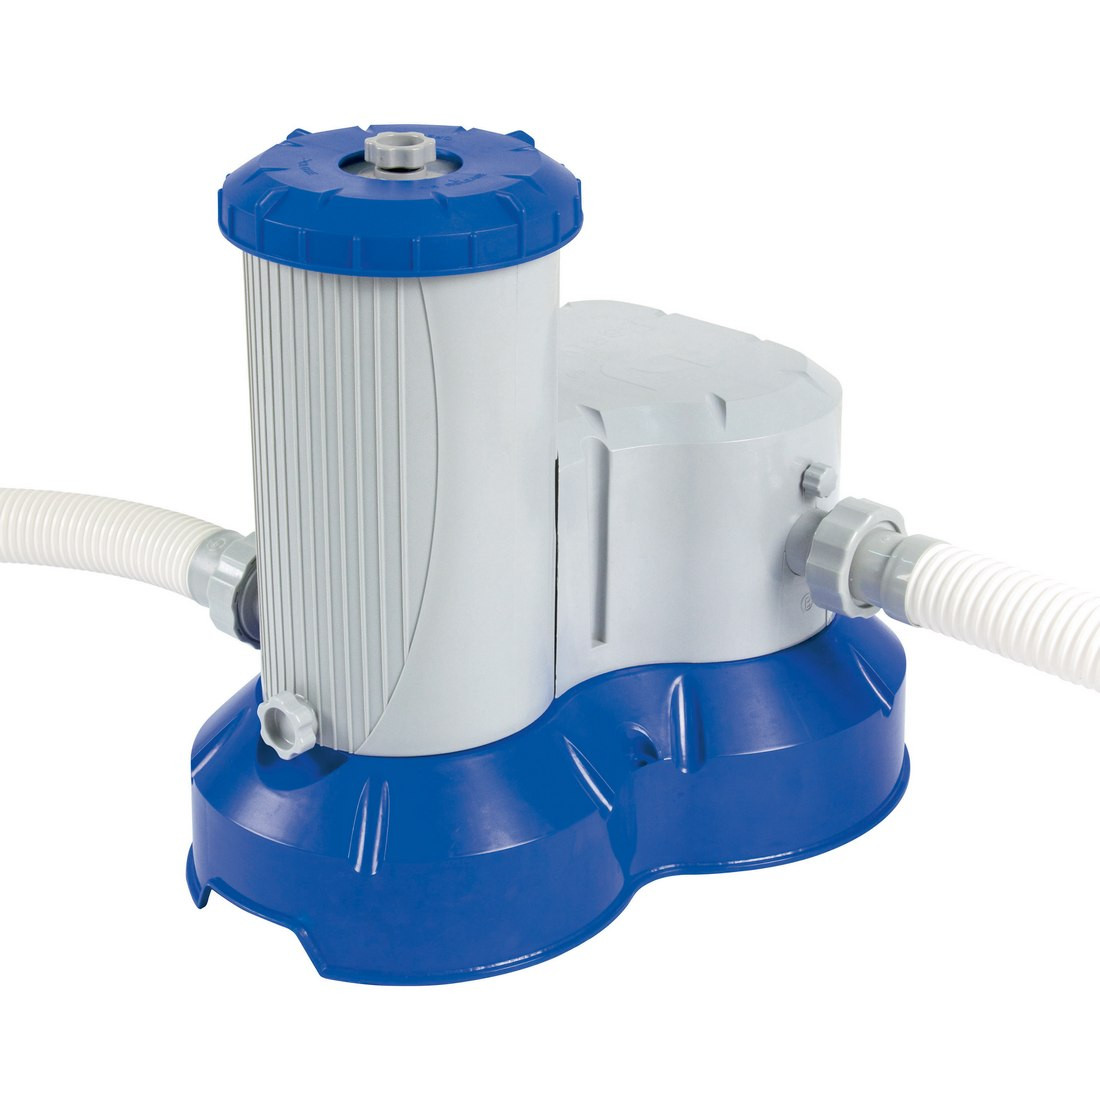 Фильтрующий насос, BESTWAY, 58221, 9.463 литров/час, Переходники 32 мм, Пластик, Серо-синий, Цветная коробка